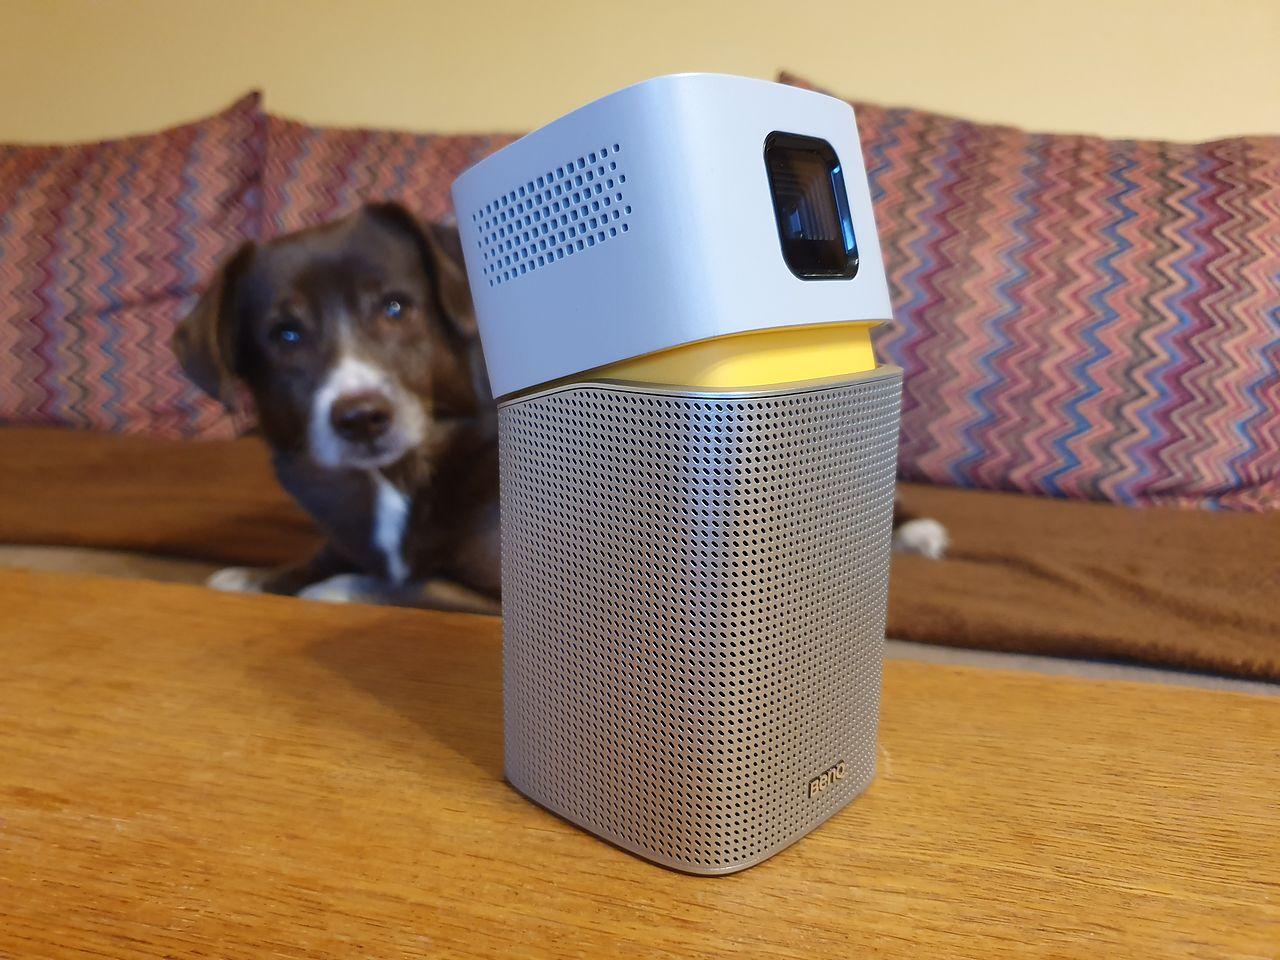 BenQ GV1 — mobilny projektor bezprzewodowy